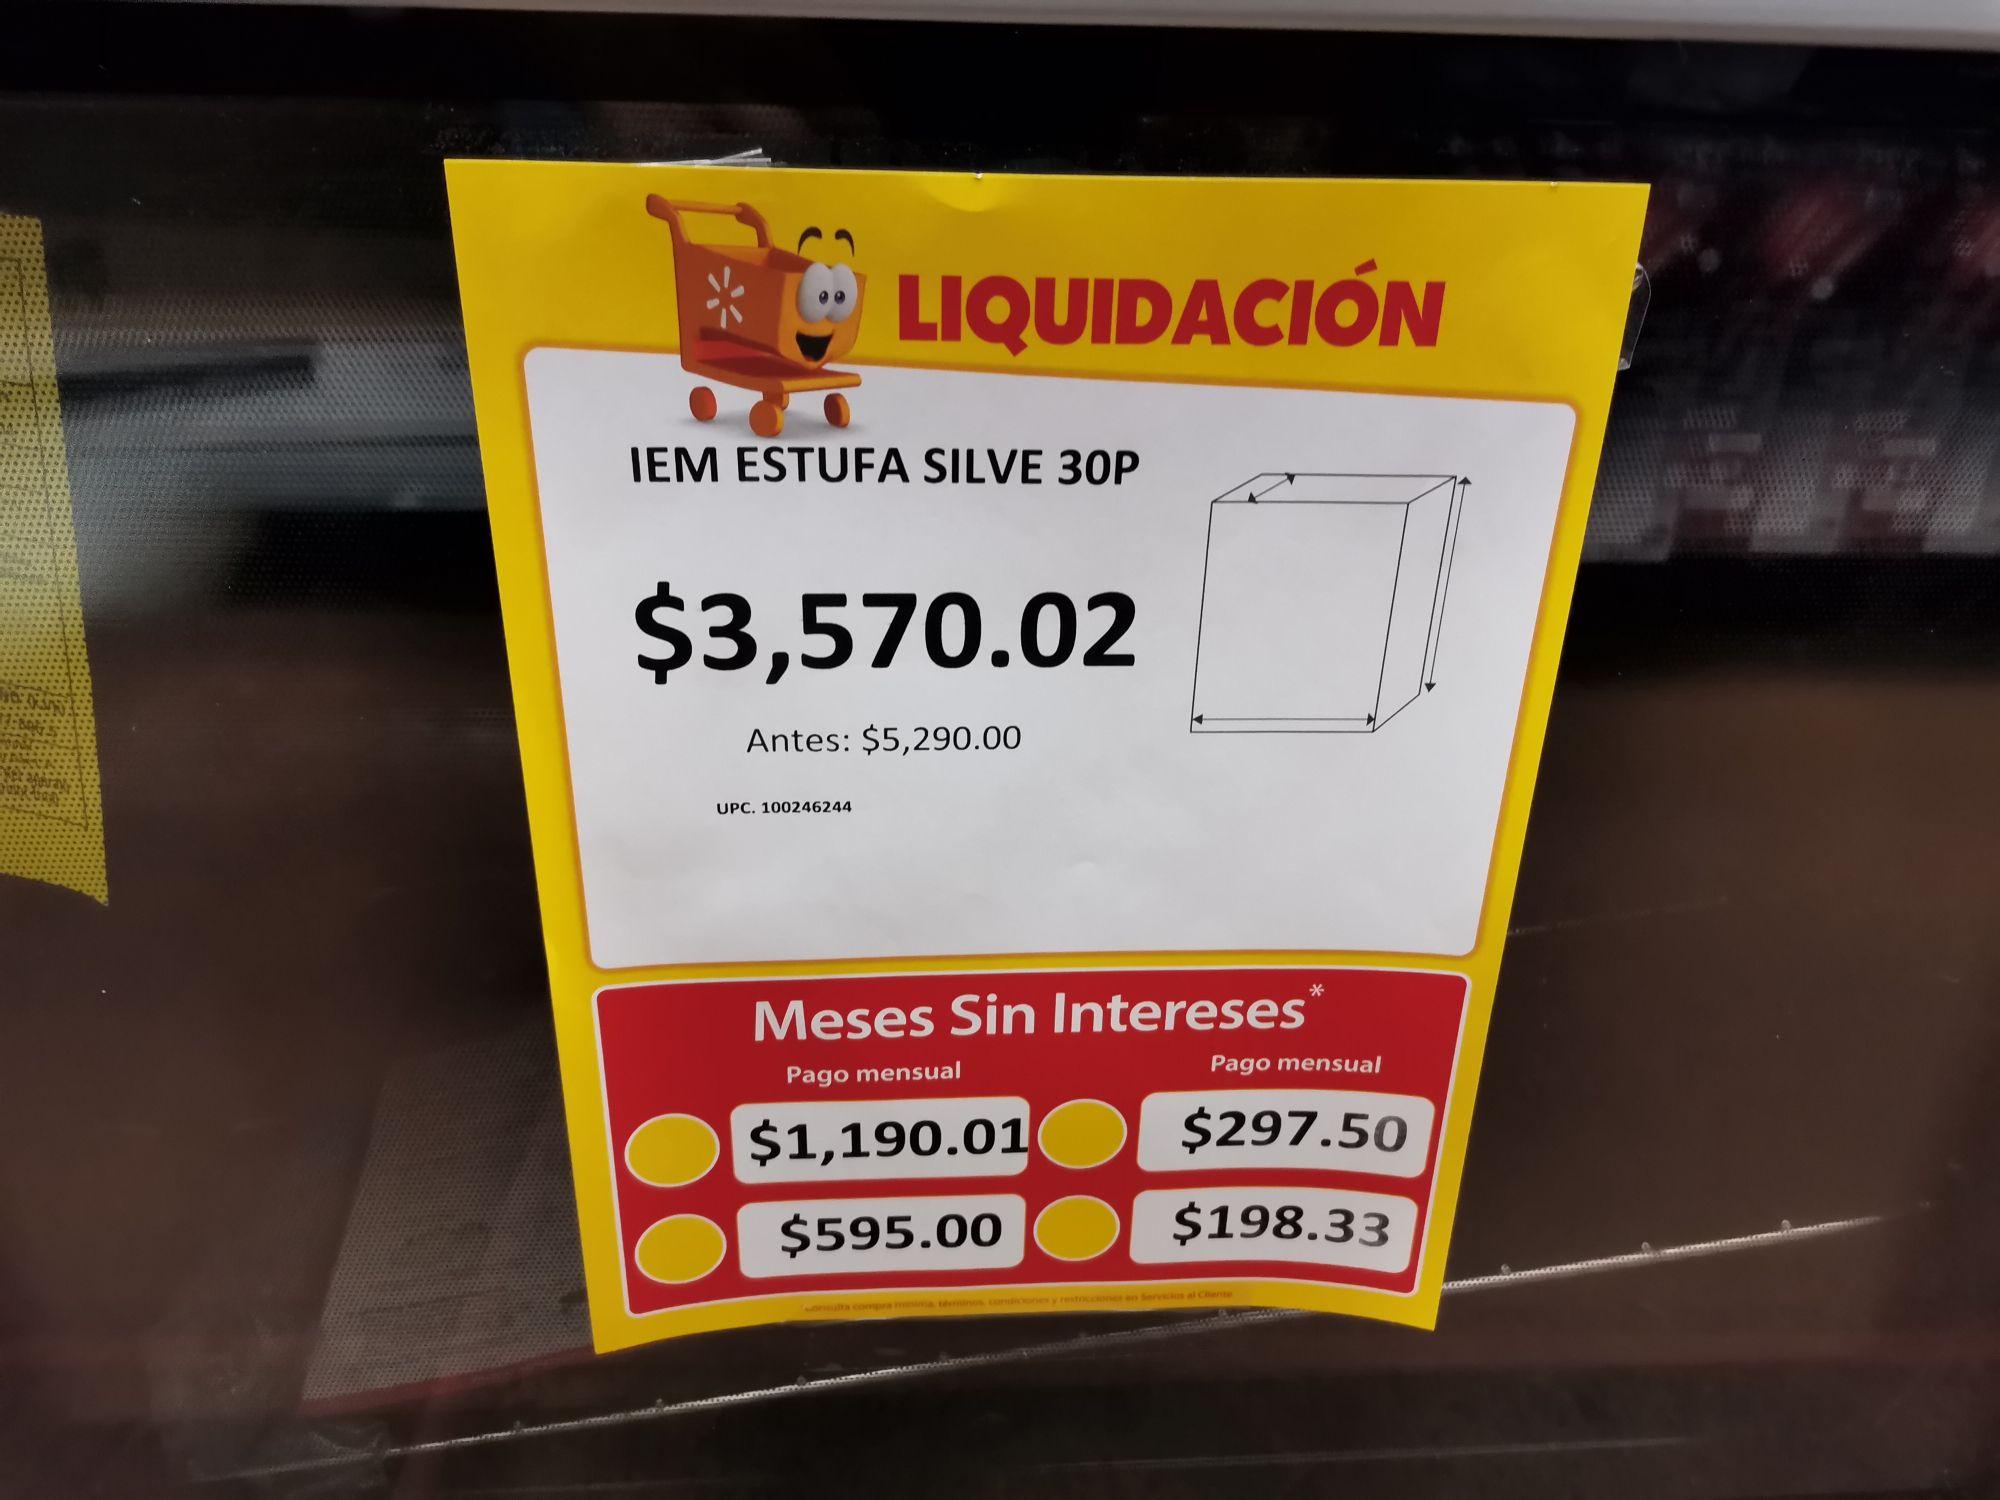 Walmart: Estufa Silver IEM 30P